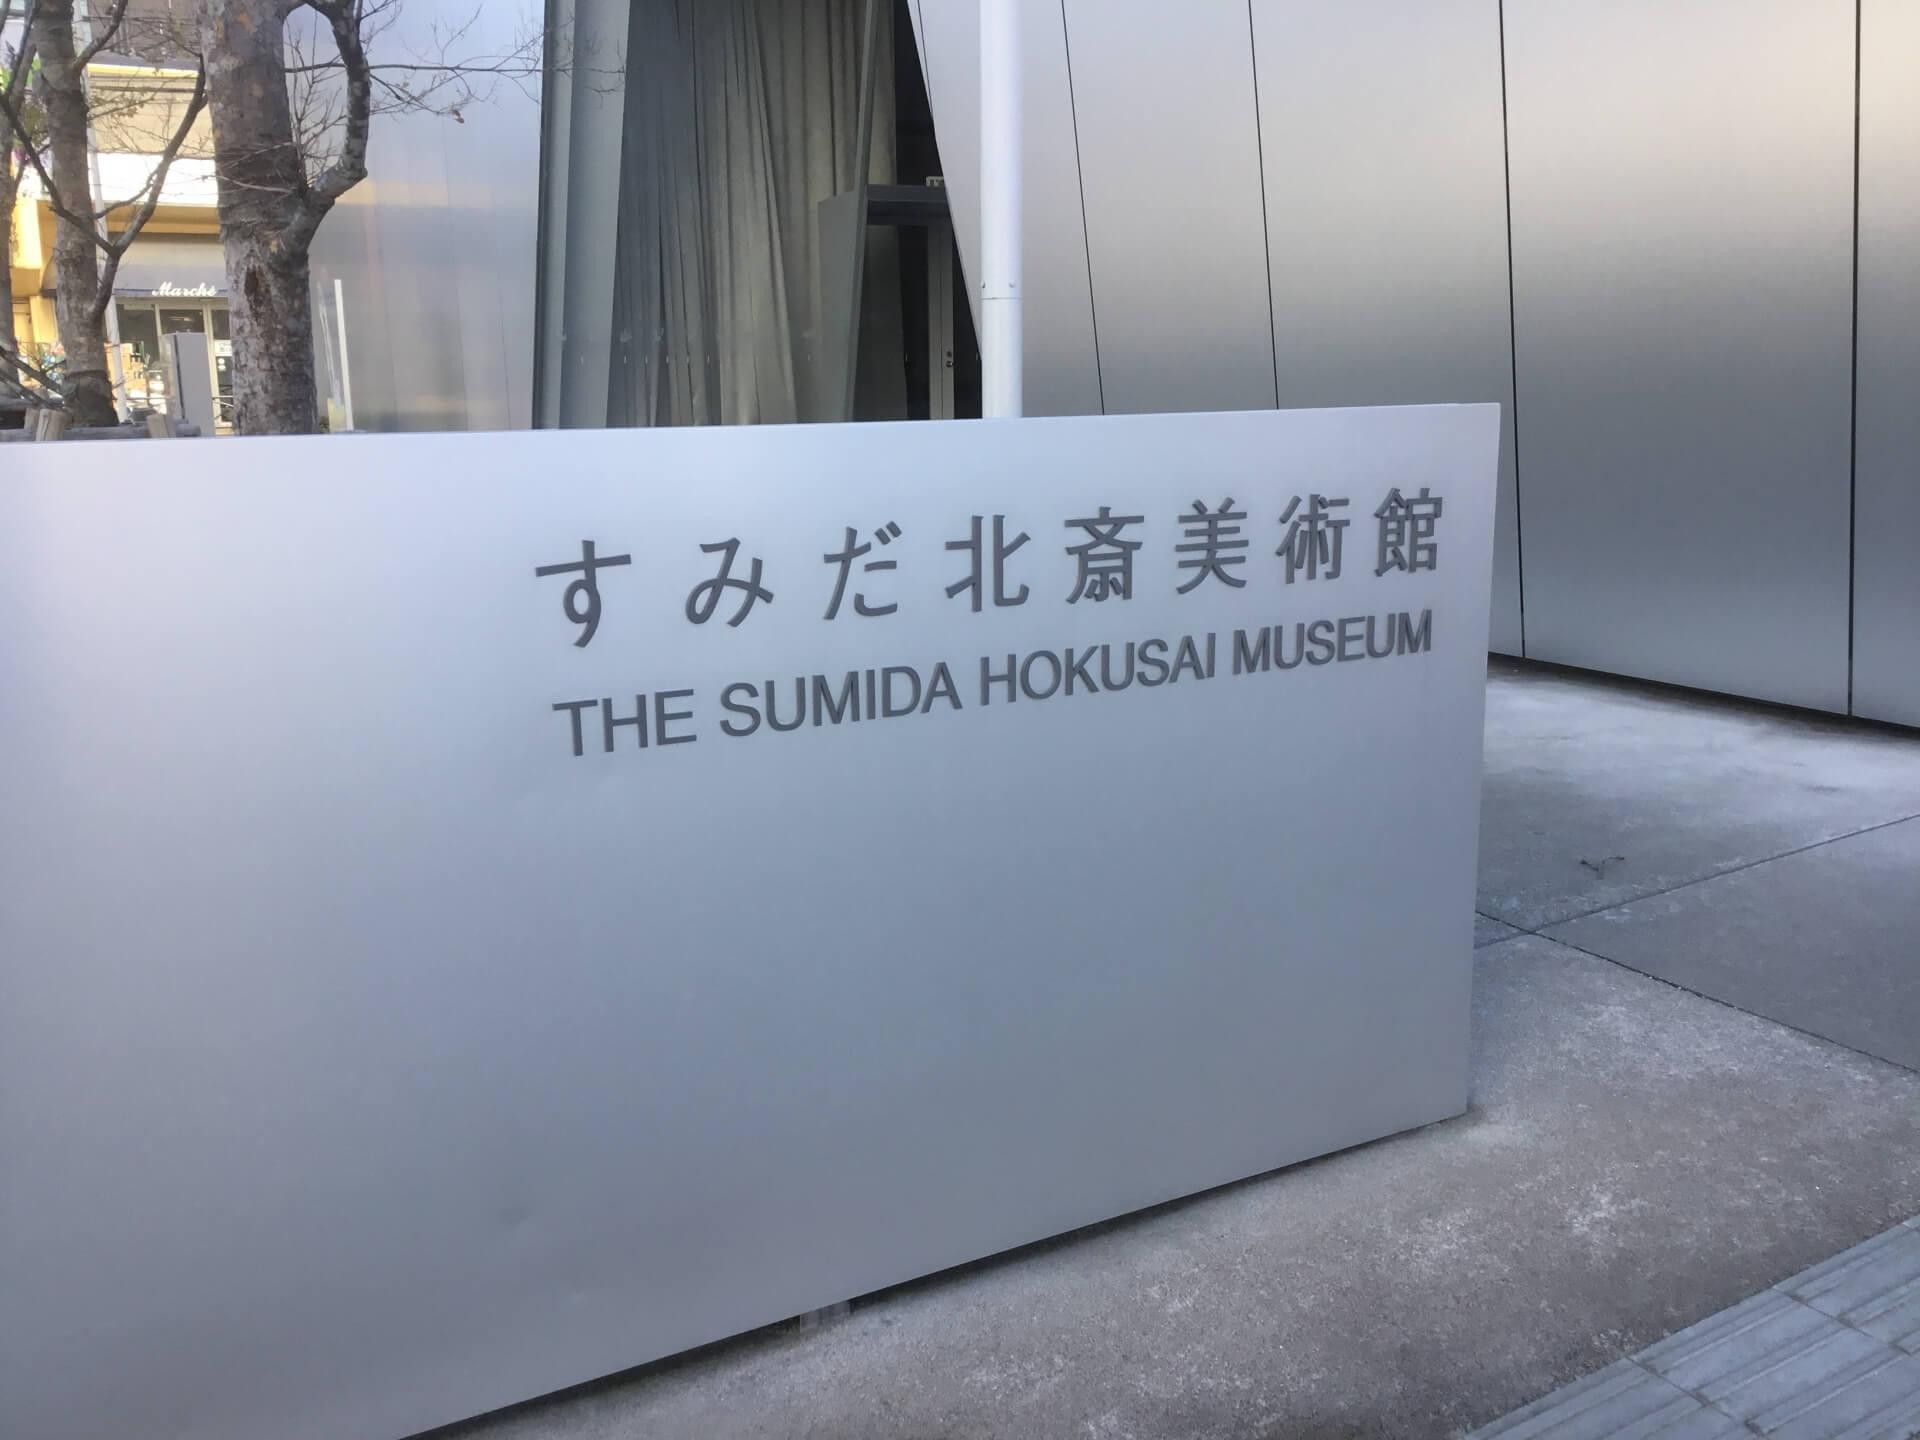 sumida-hokusai-museum-tokyo